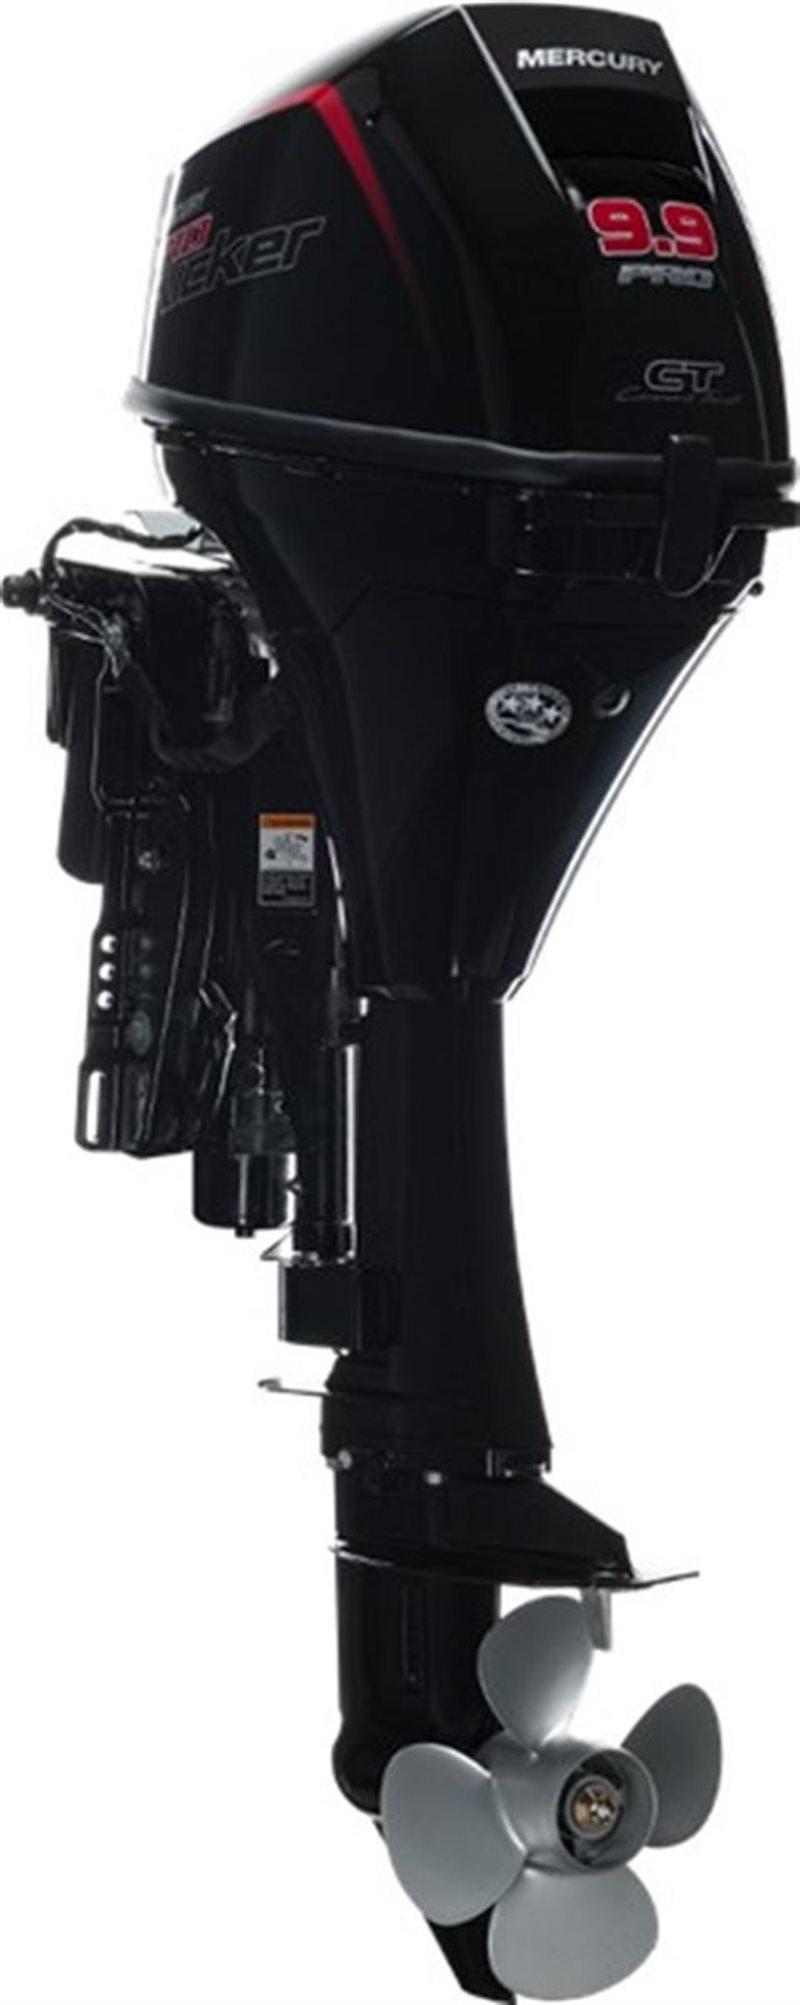 99 hp ProKicker at Youngblood RV & Powersports Springfield Missouri - Ozark MO